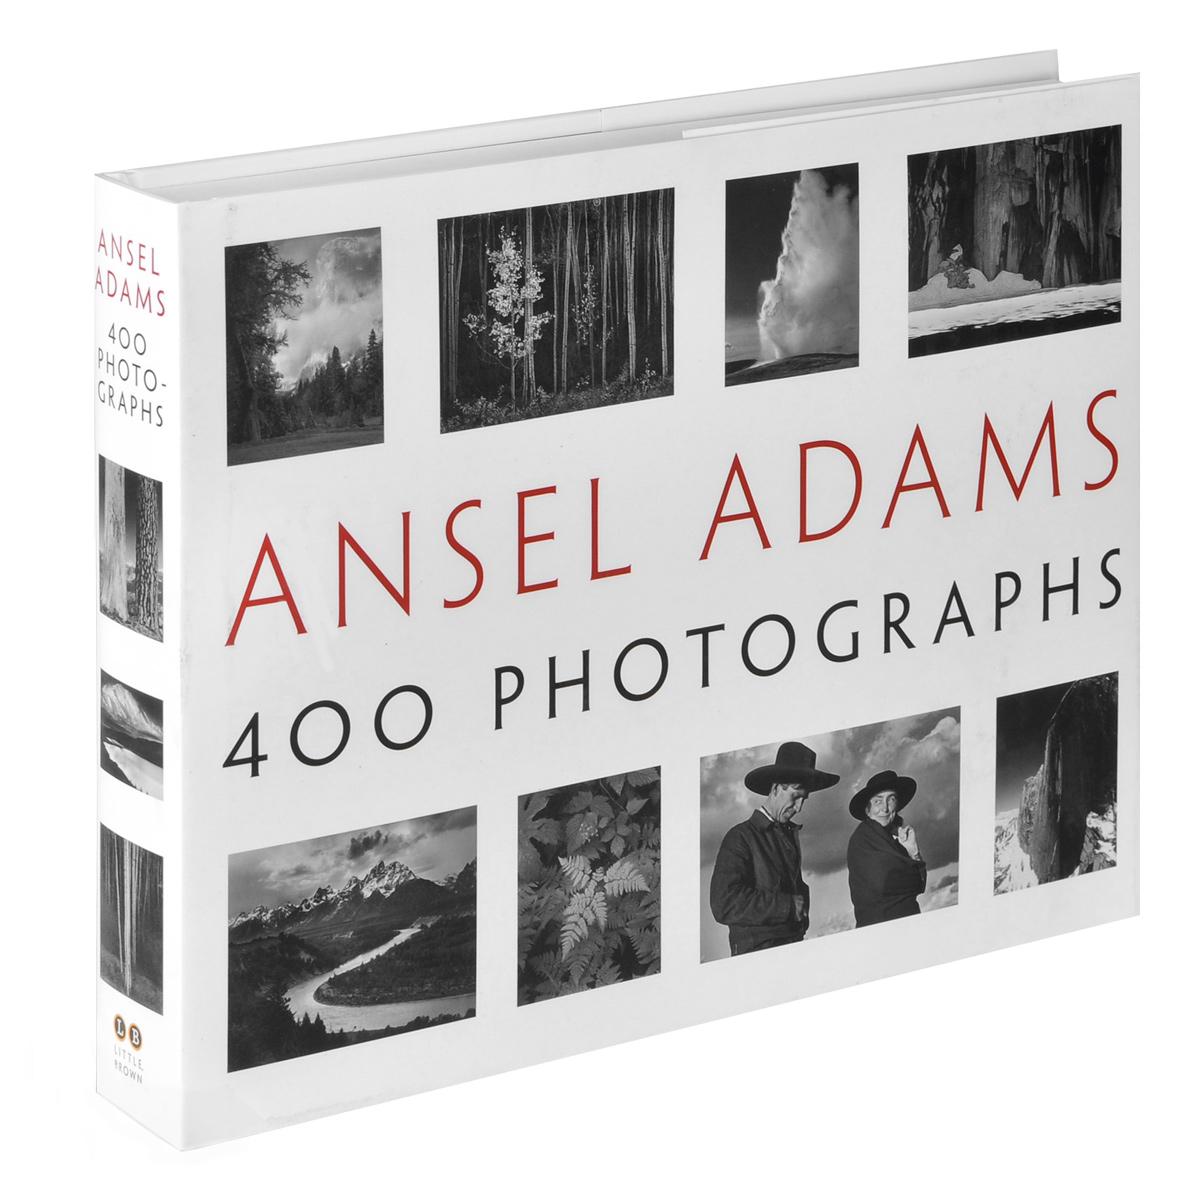 OZON.ru - Книги | Ansel Adams: 400 Photographs | Ansel Adams | Купить книги: интернет-магазин / ISBN 0-316-11772-2, 978-0-316-11772-2